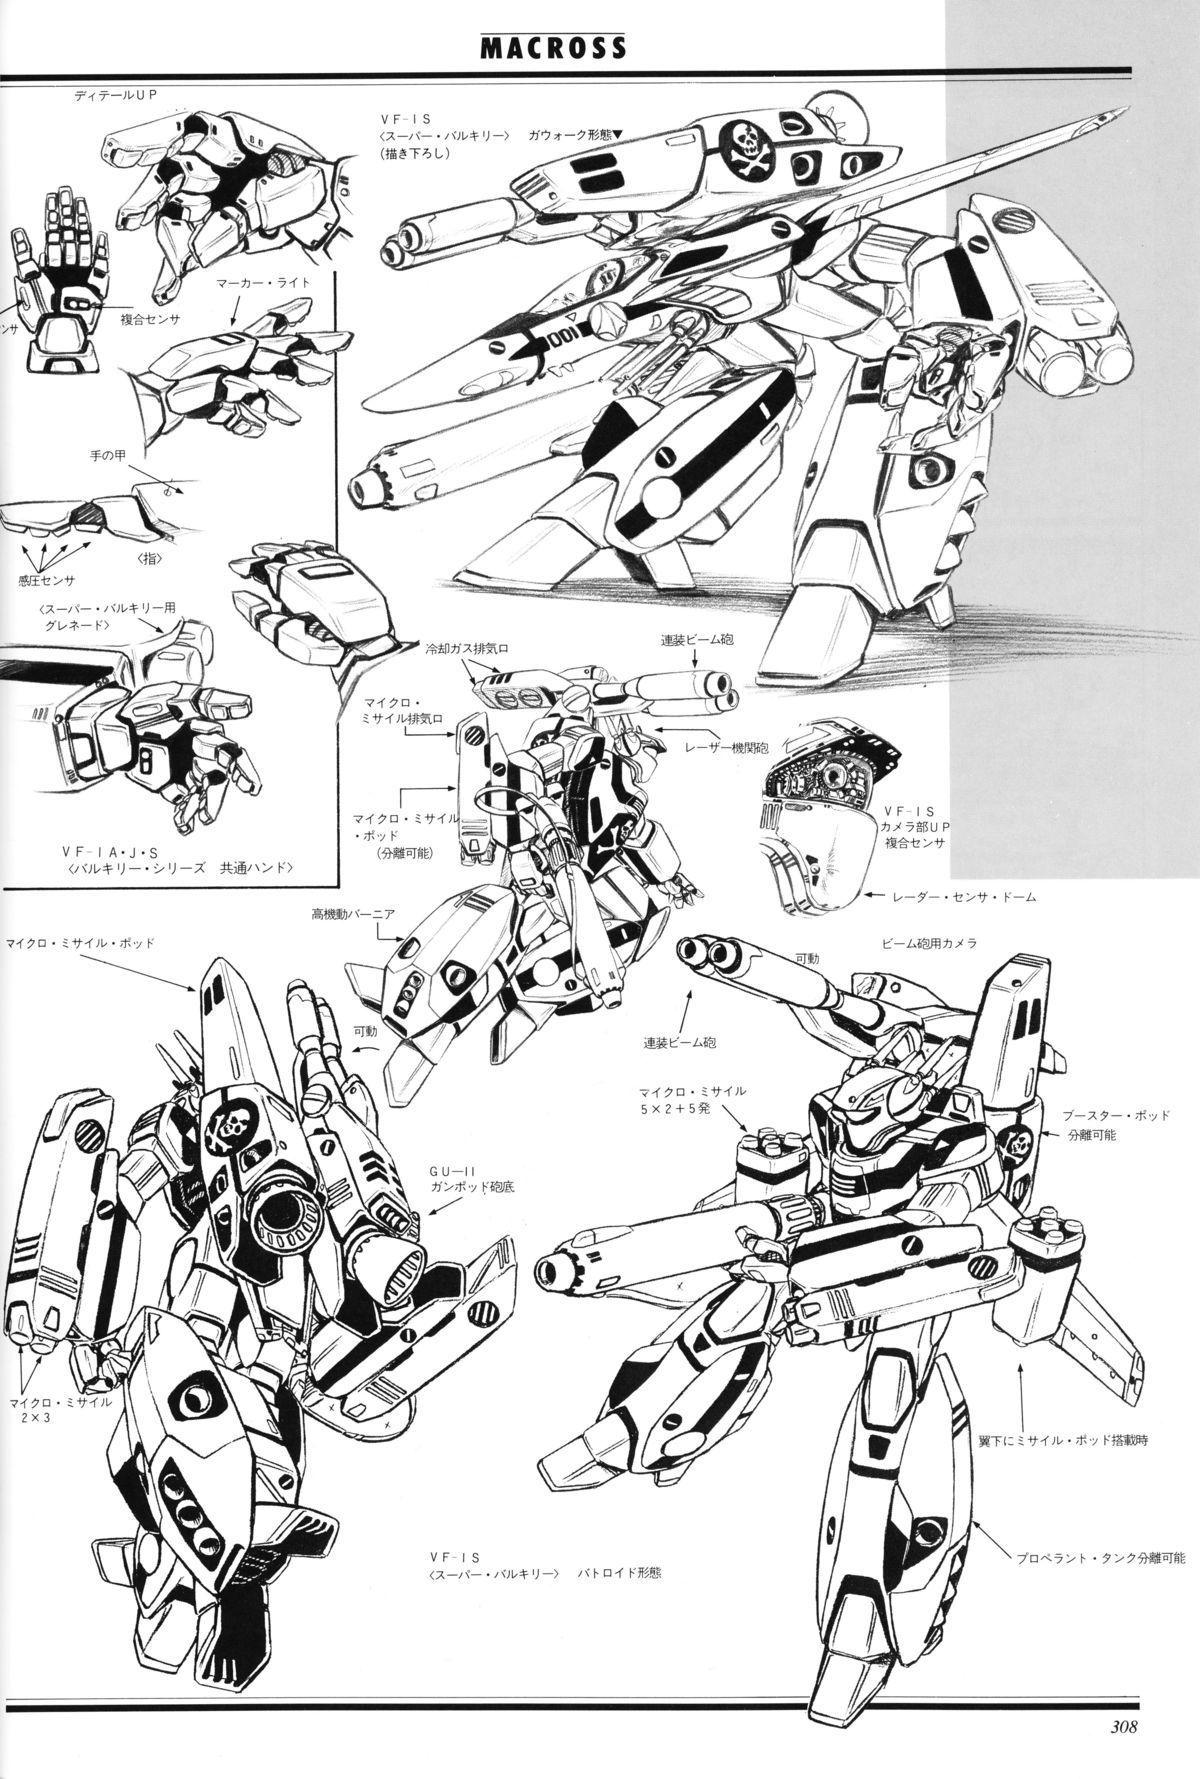 rocketumblr vf 1 movie ロボットアート sf アート 設定画